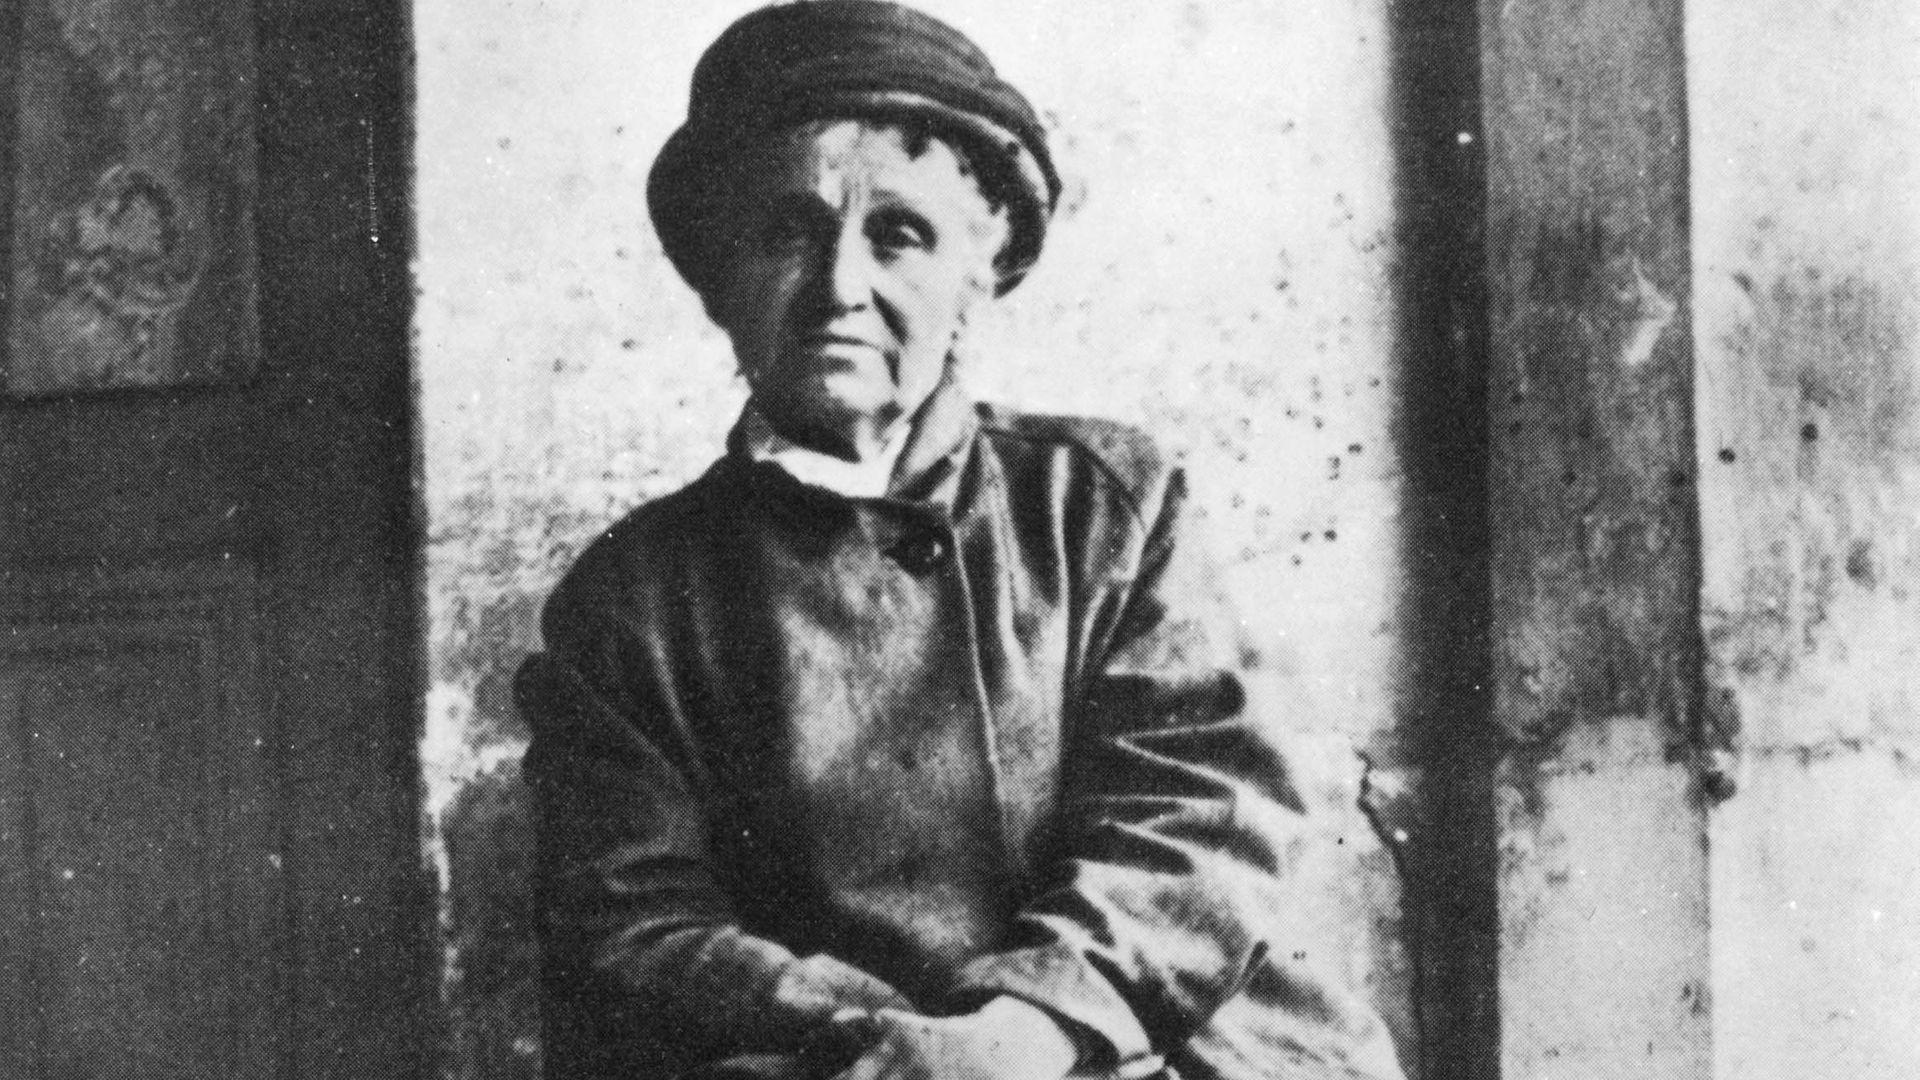 French sculptor Camille Claudel in 1935 - Credit: Mondadori Portfolio/Archivio Mar